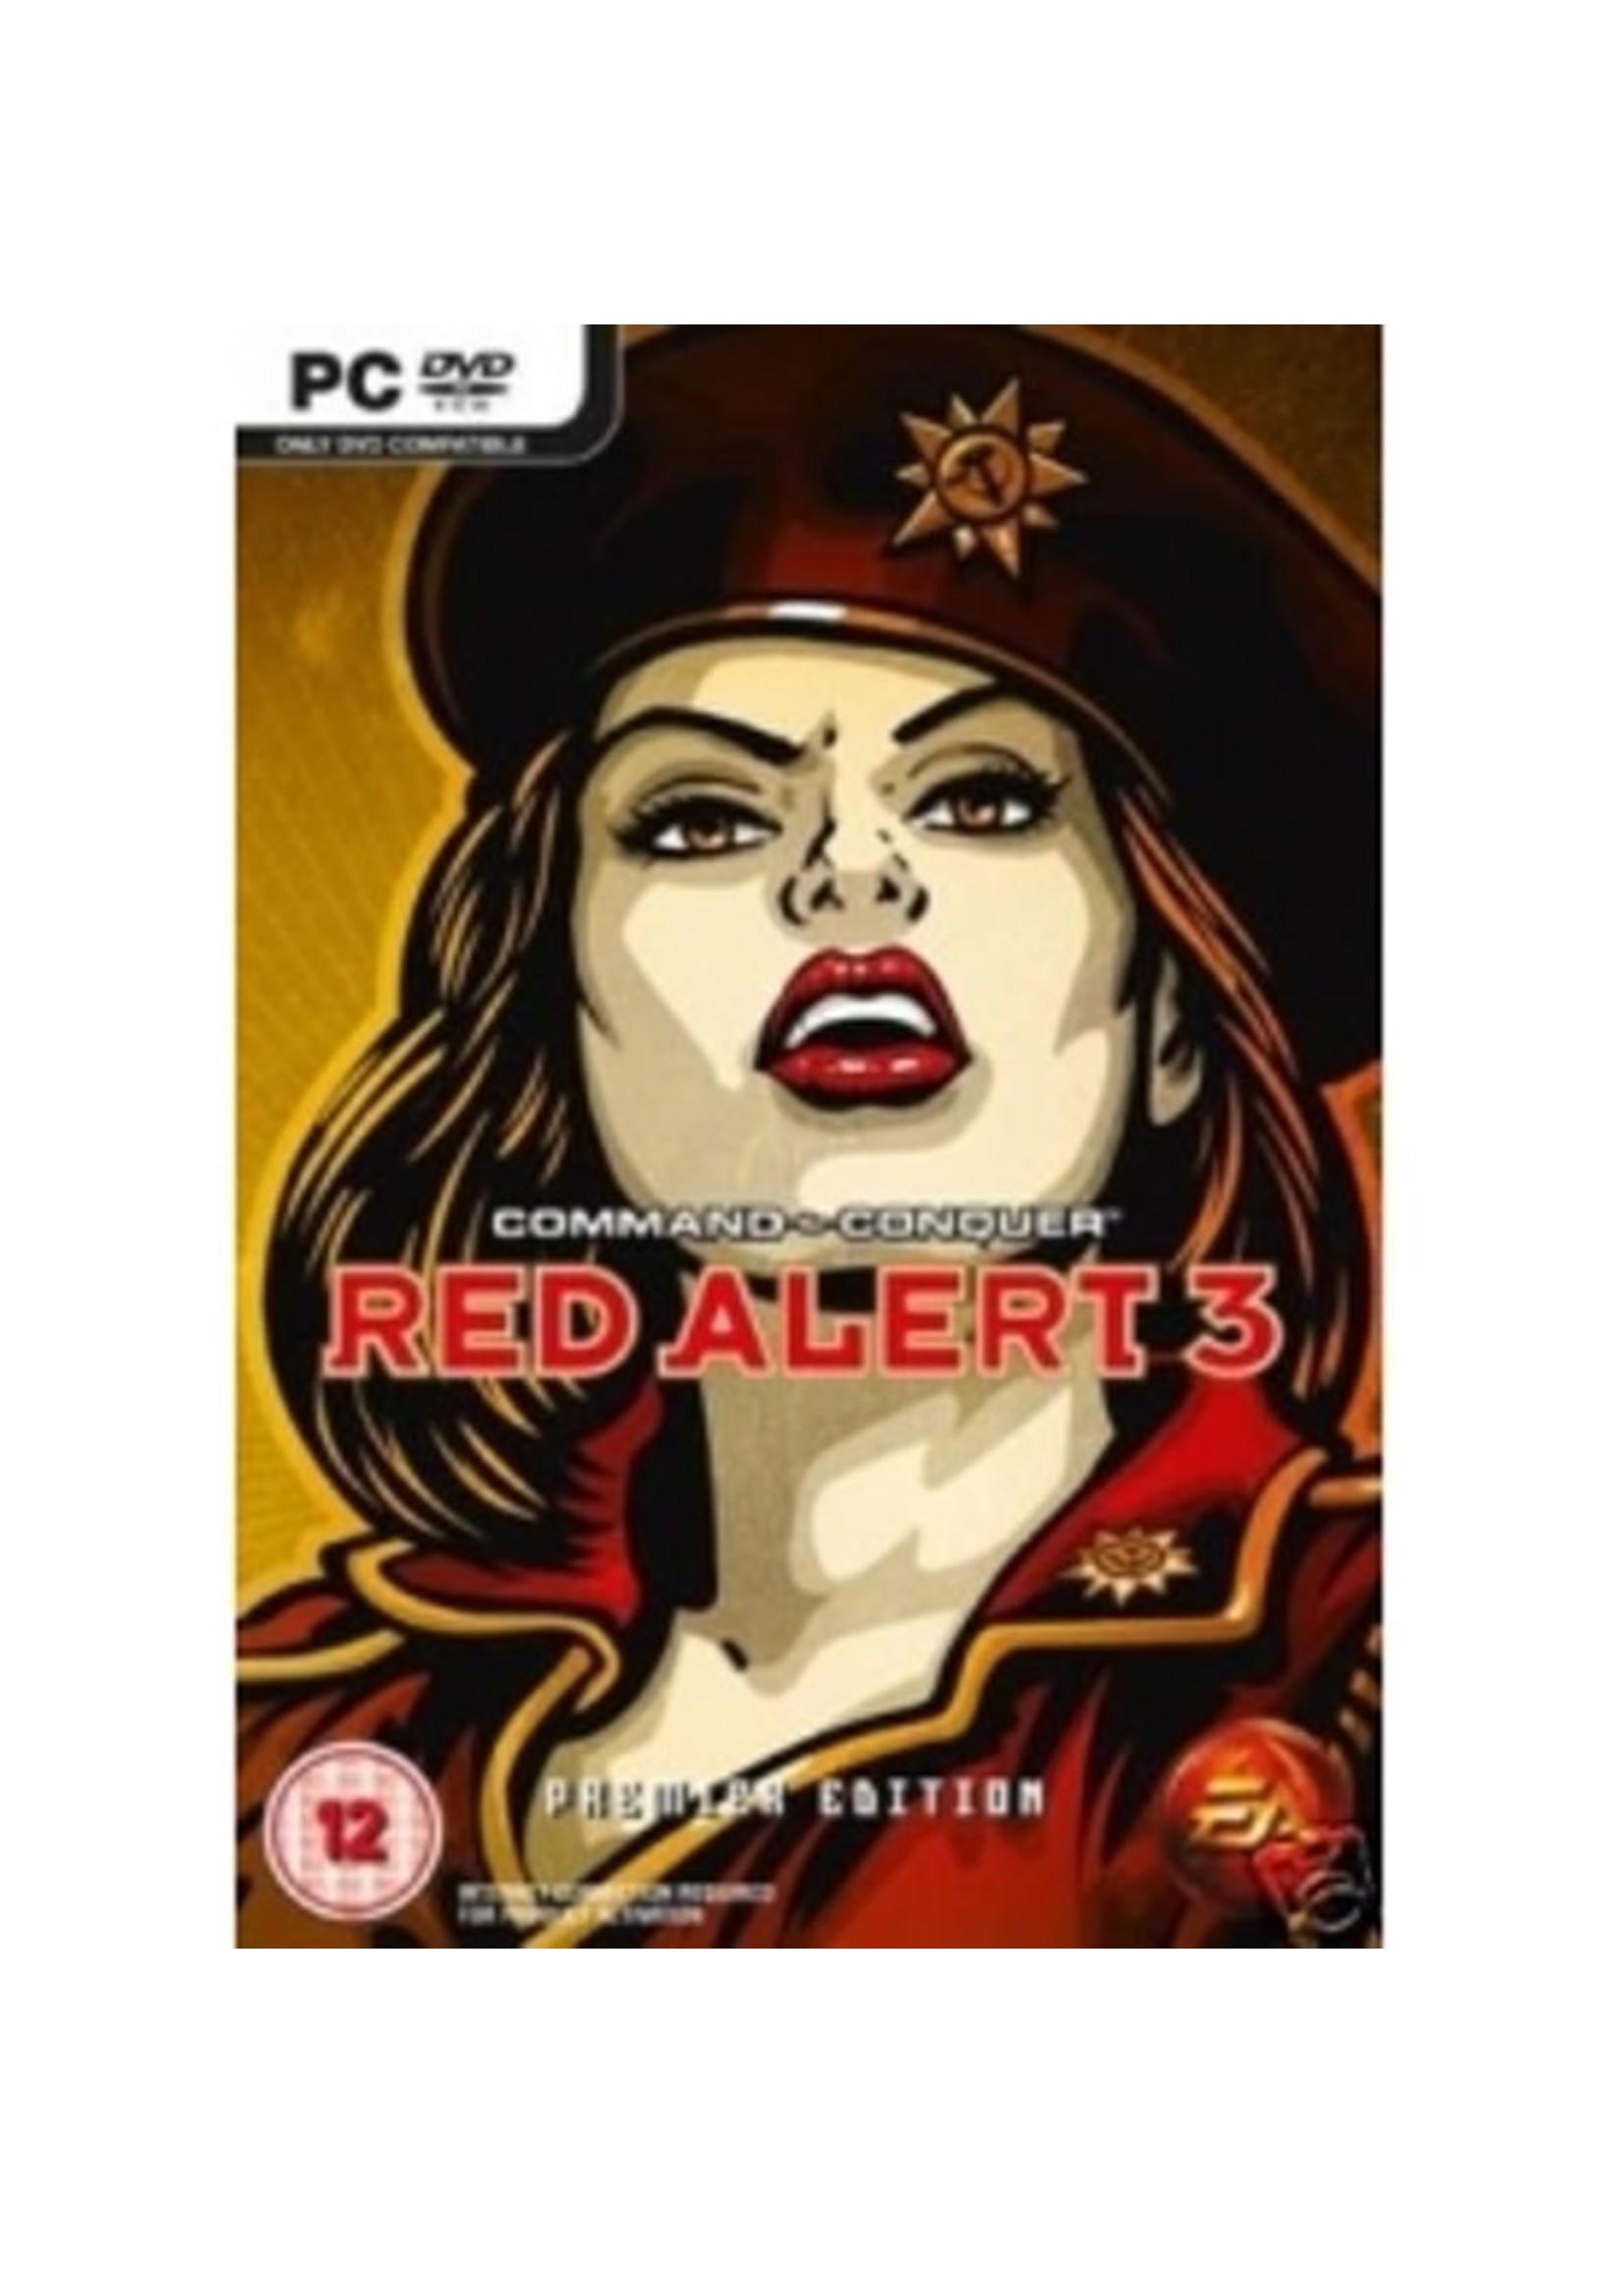 Red Alert 3 Premier Edition PC Games